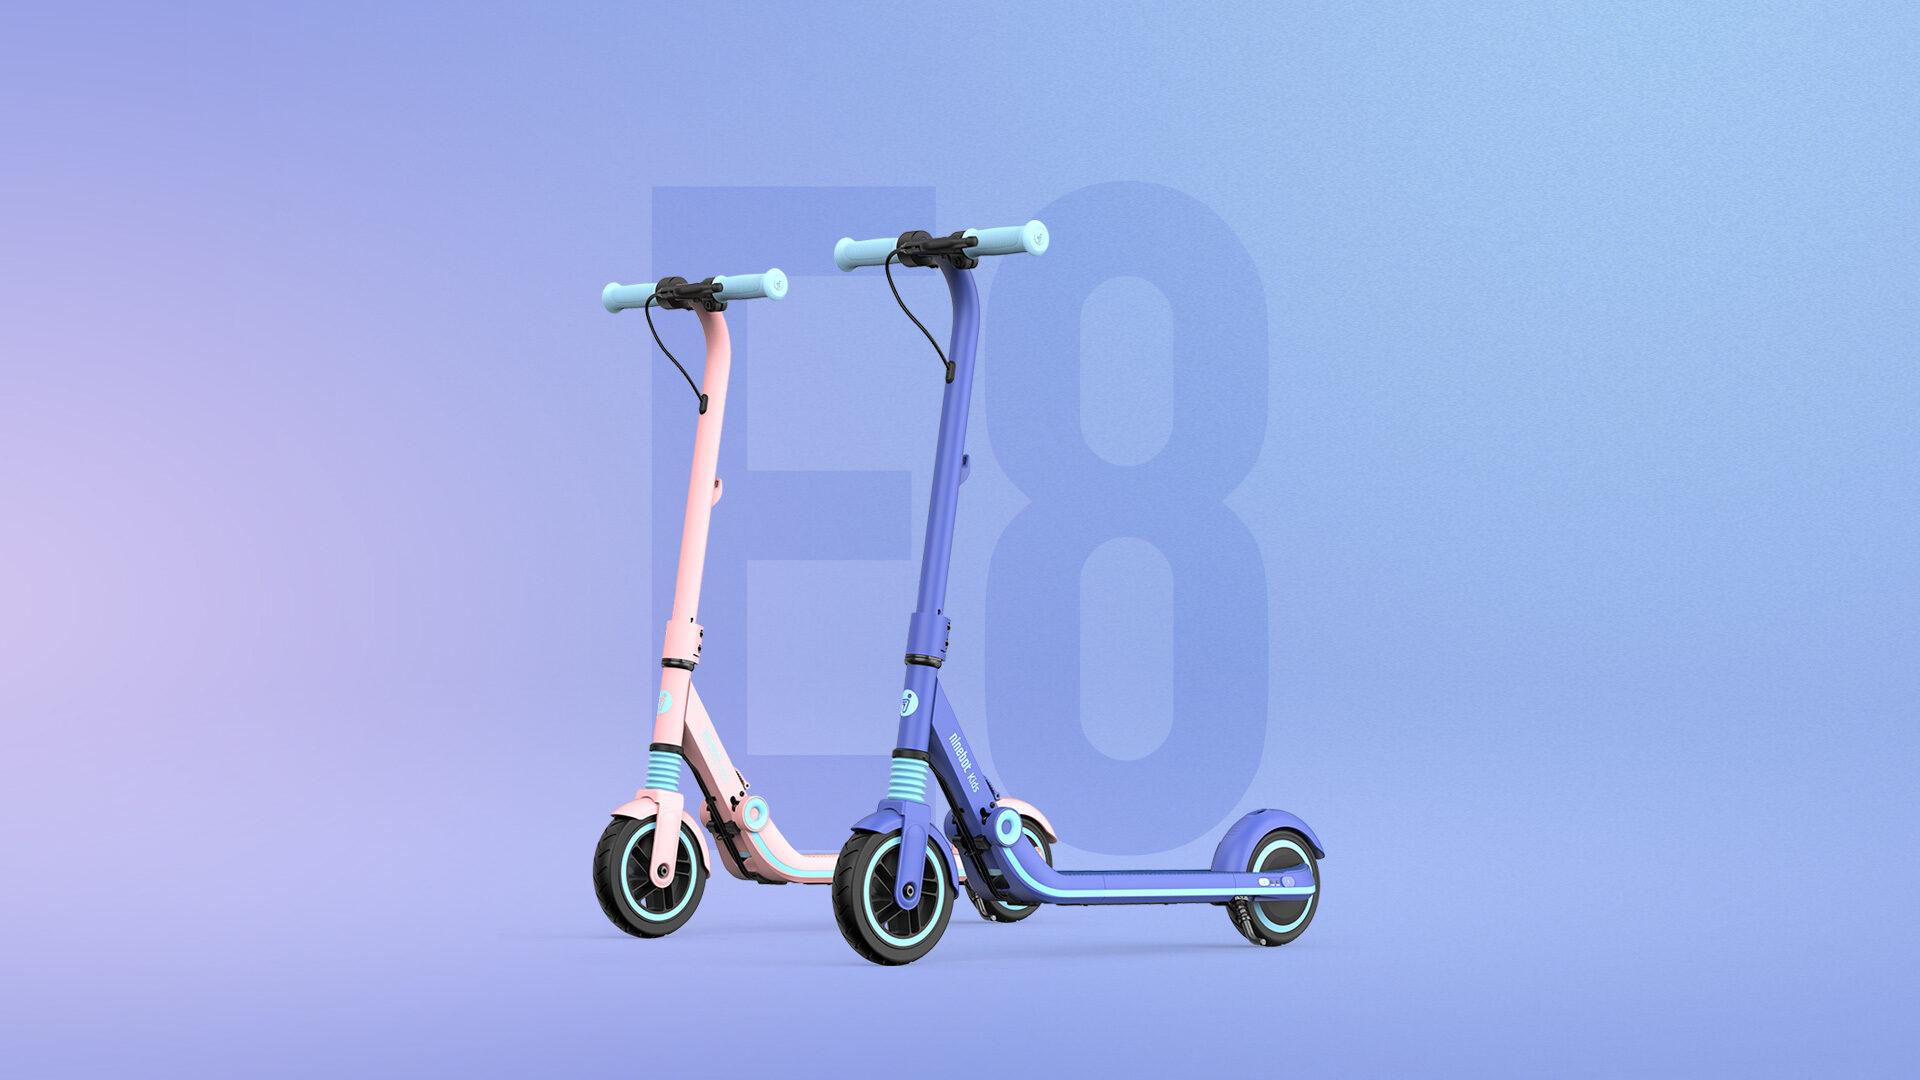 [hero] Ninebot eKickScooter ZING E8 Powered by Segway